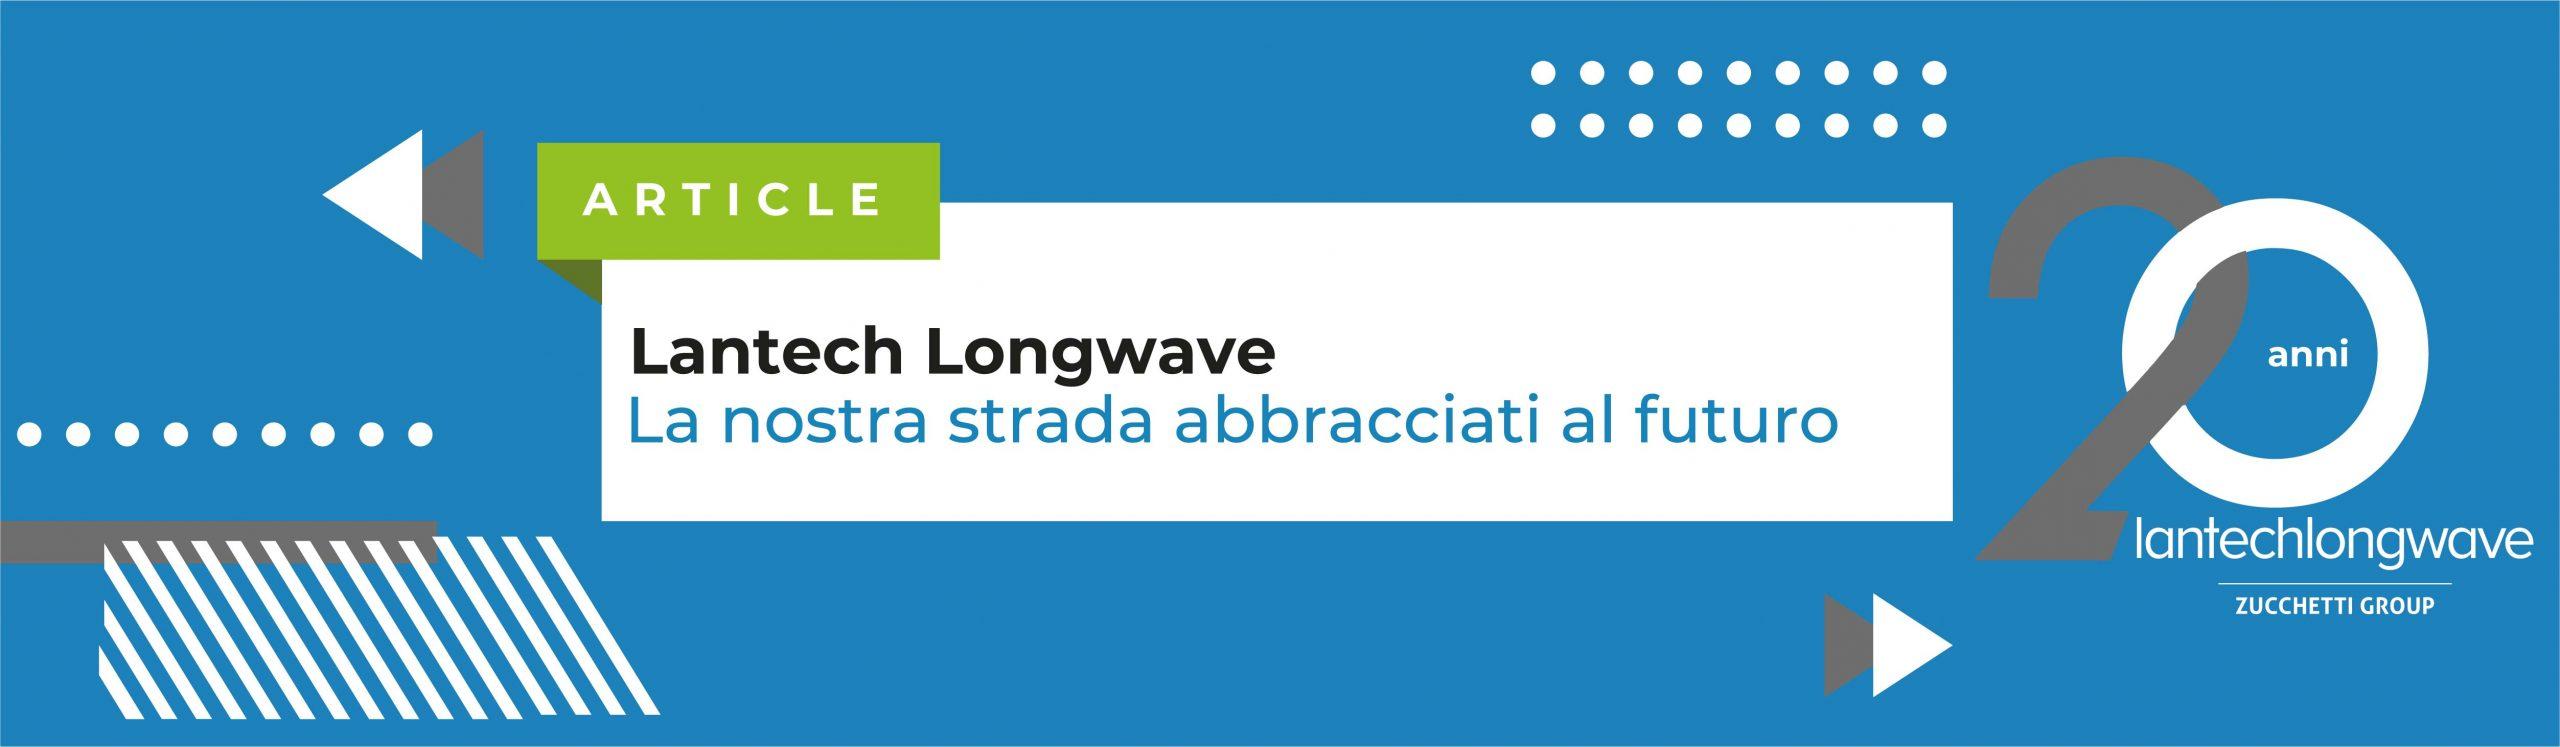 Lantech Longwave festeggia 20 anni